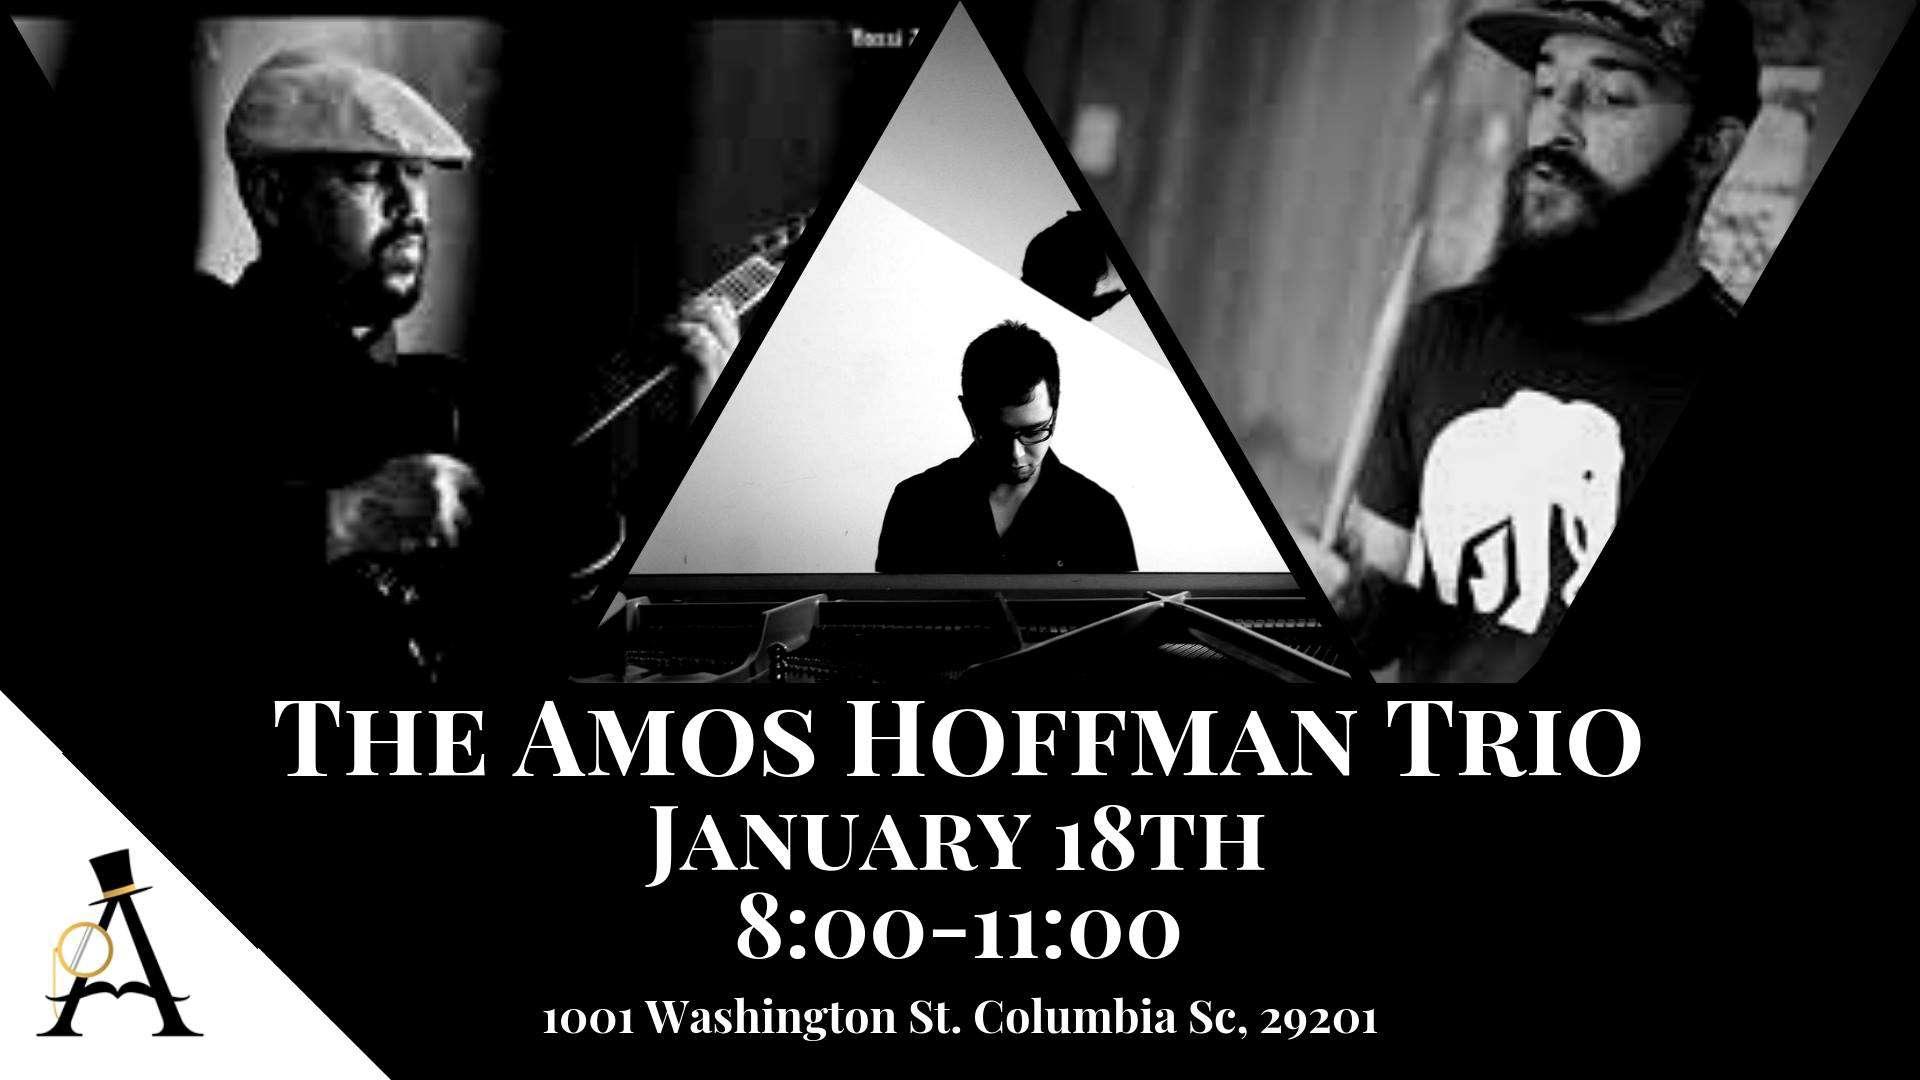 The Amos Hoffman Trio